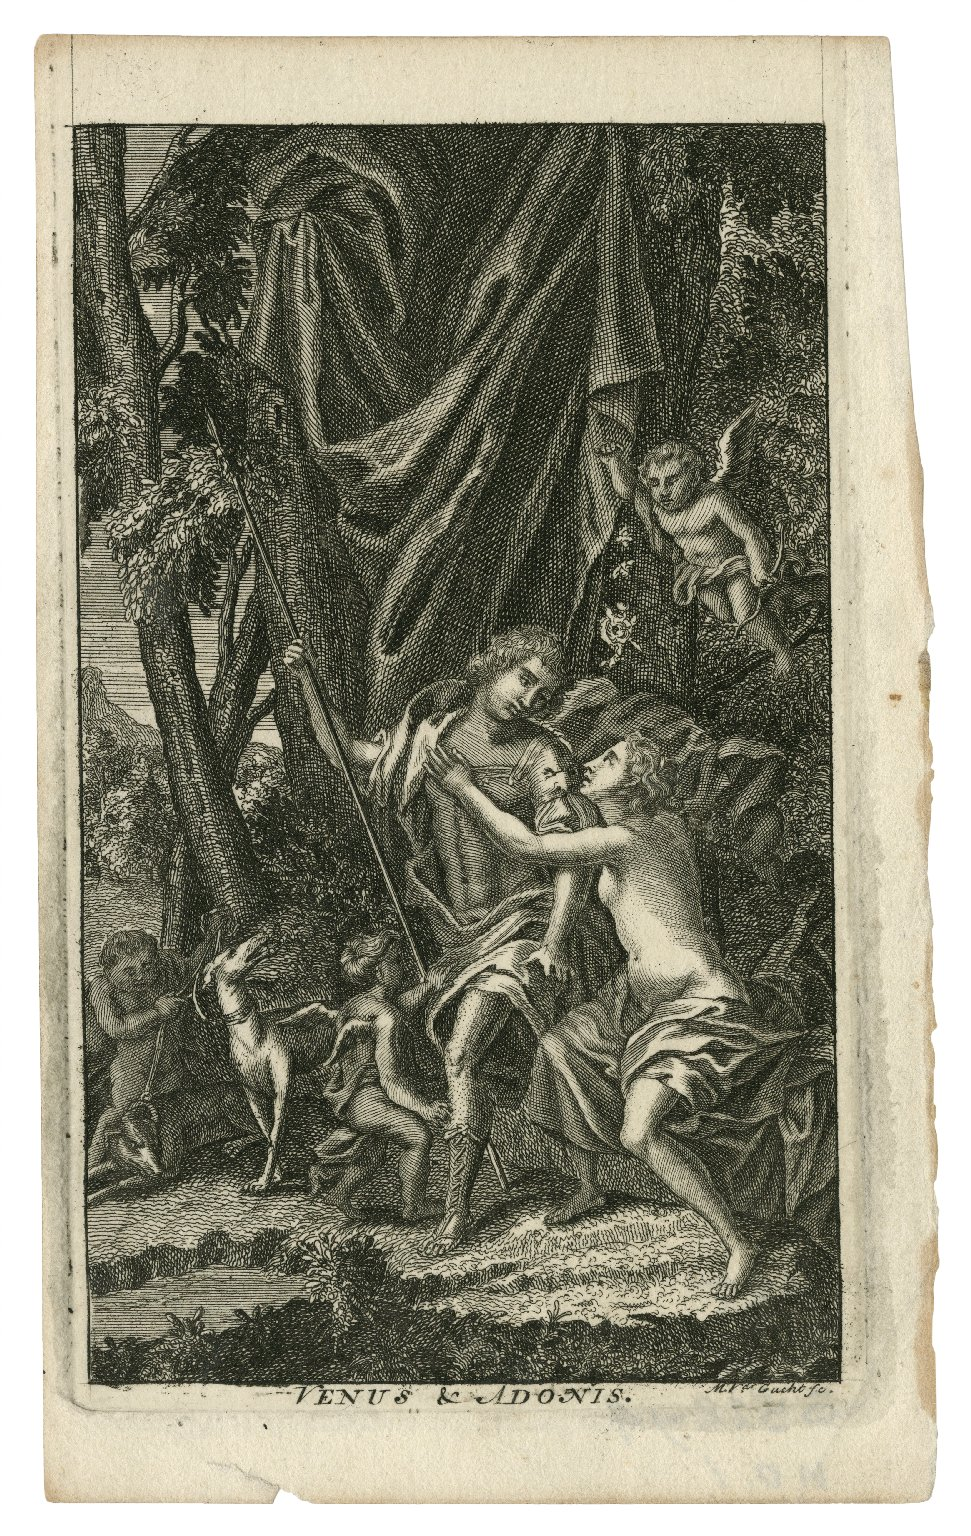 Venus & Adonis [graphic] / M.Vdr. Gucht, sc.